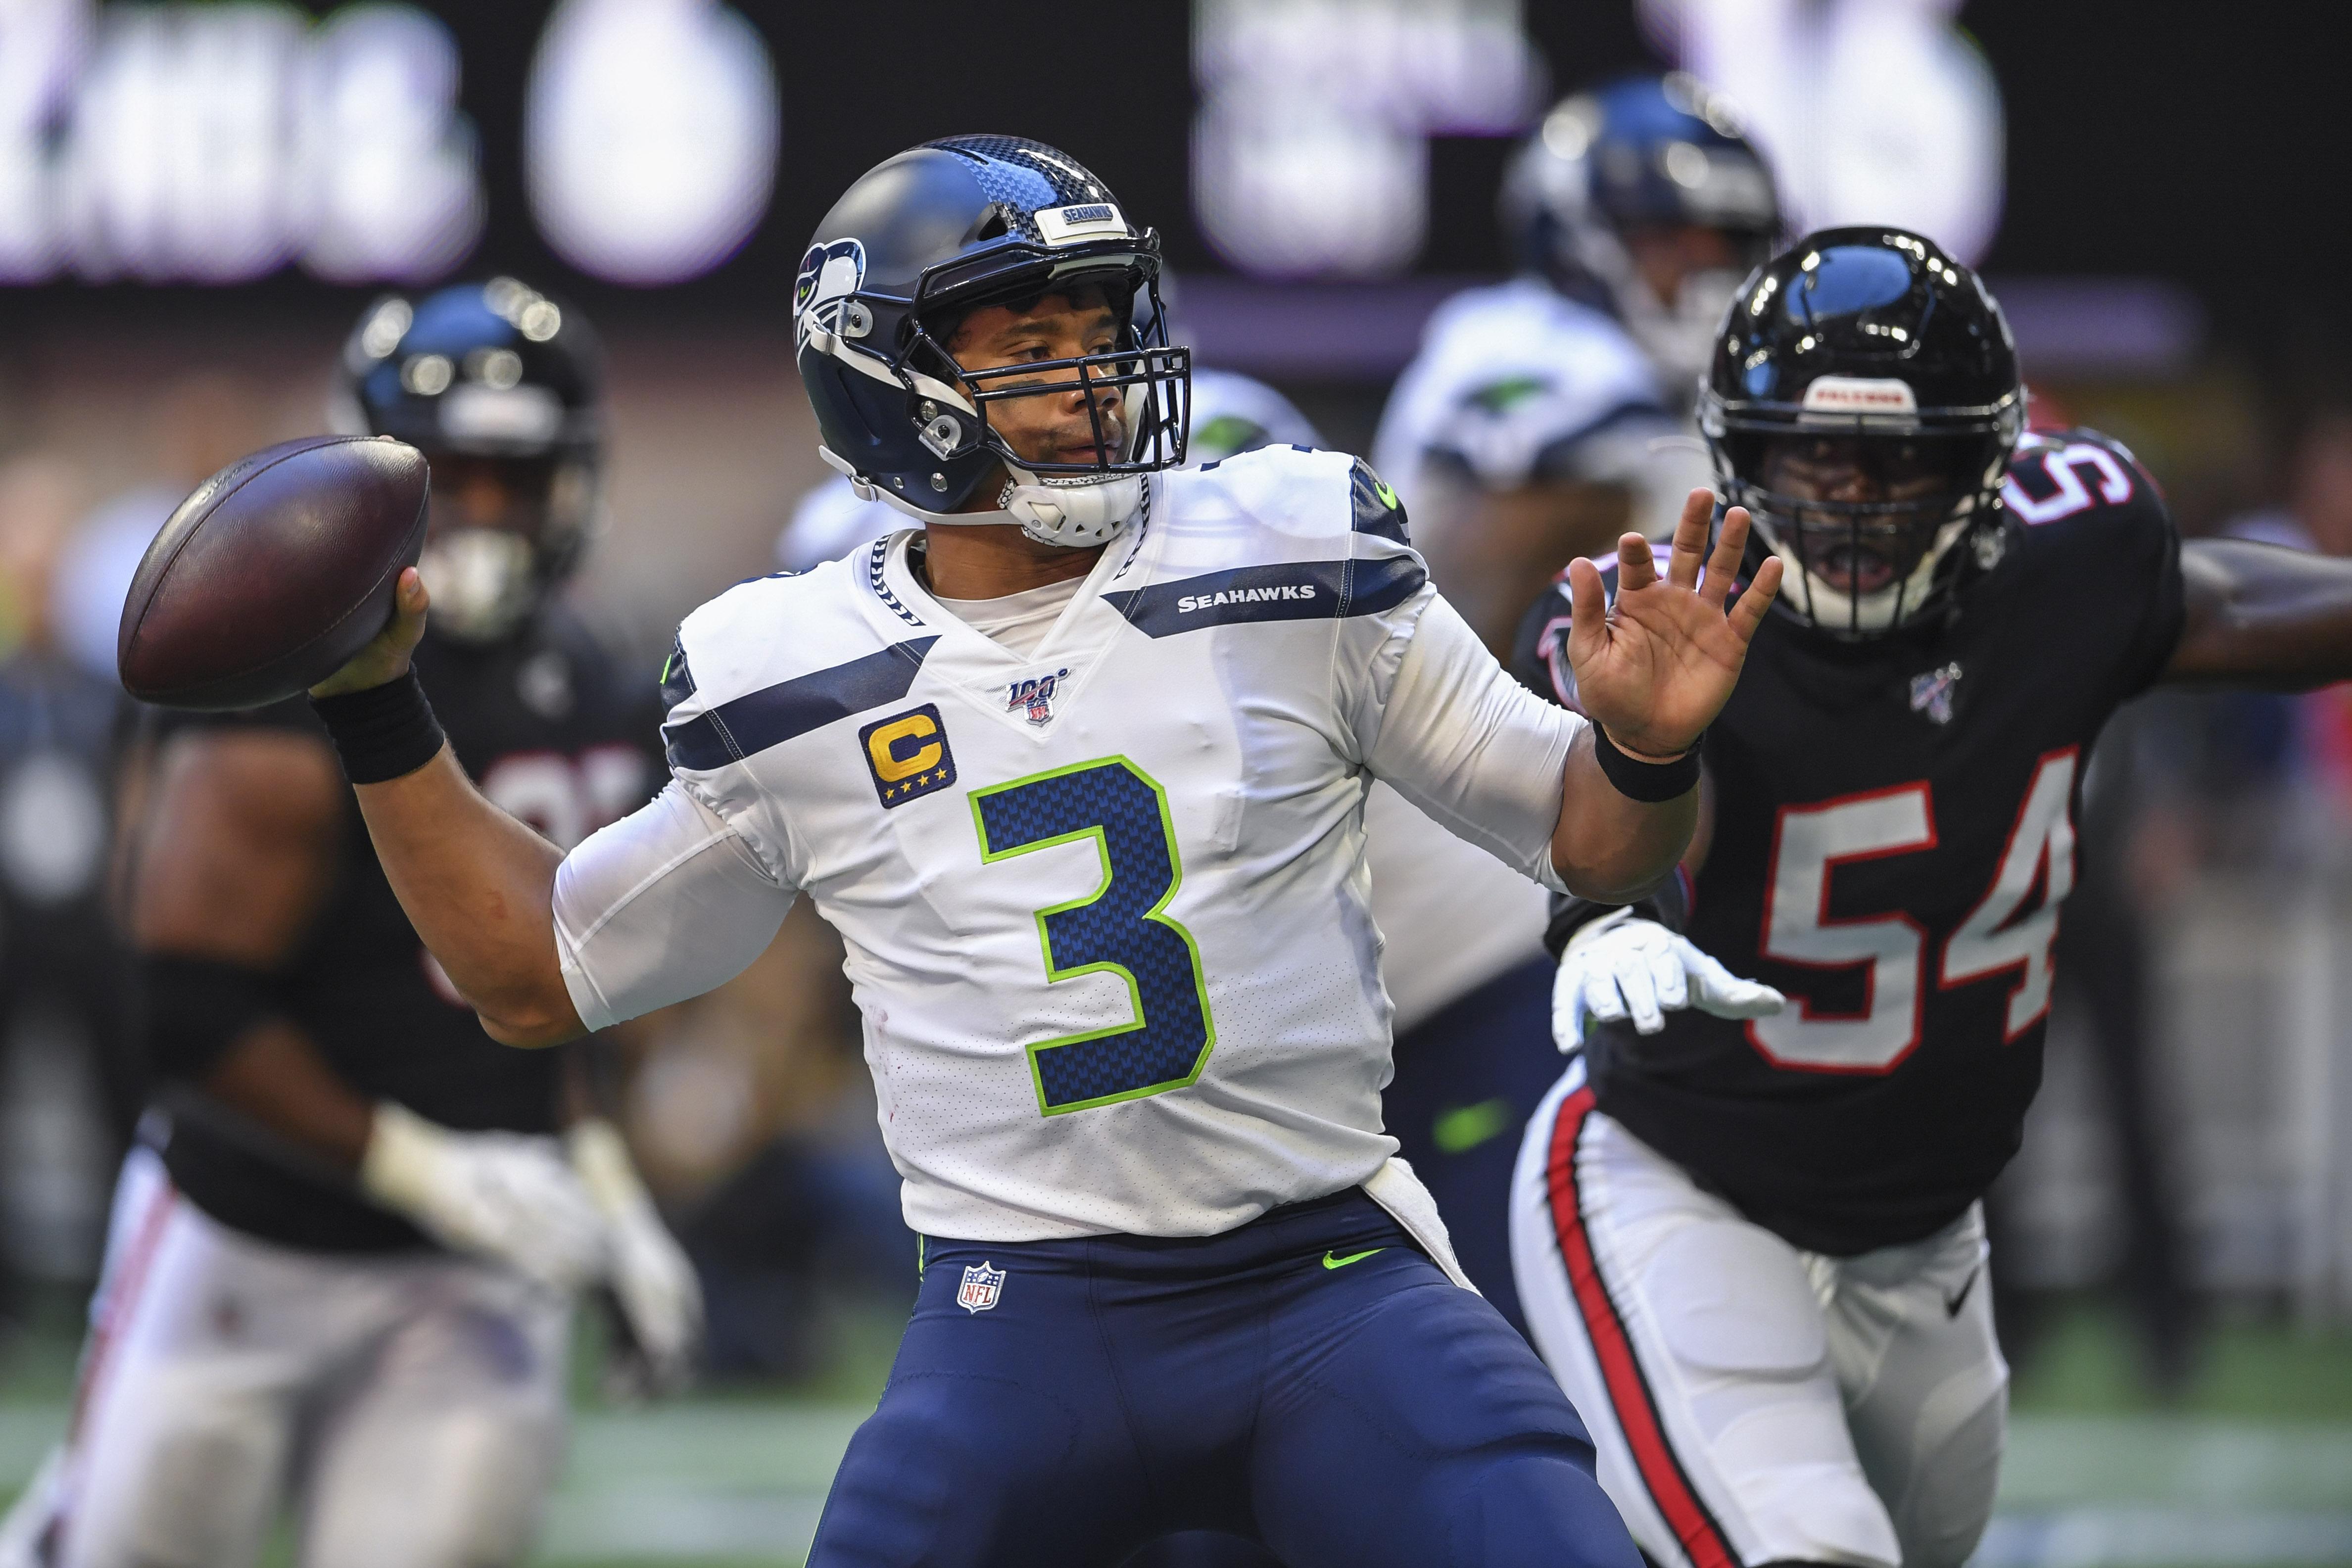 nfl quarterback rankings 2019 2020 season - HD1200×800